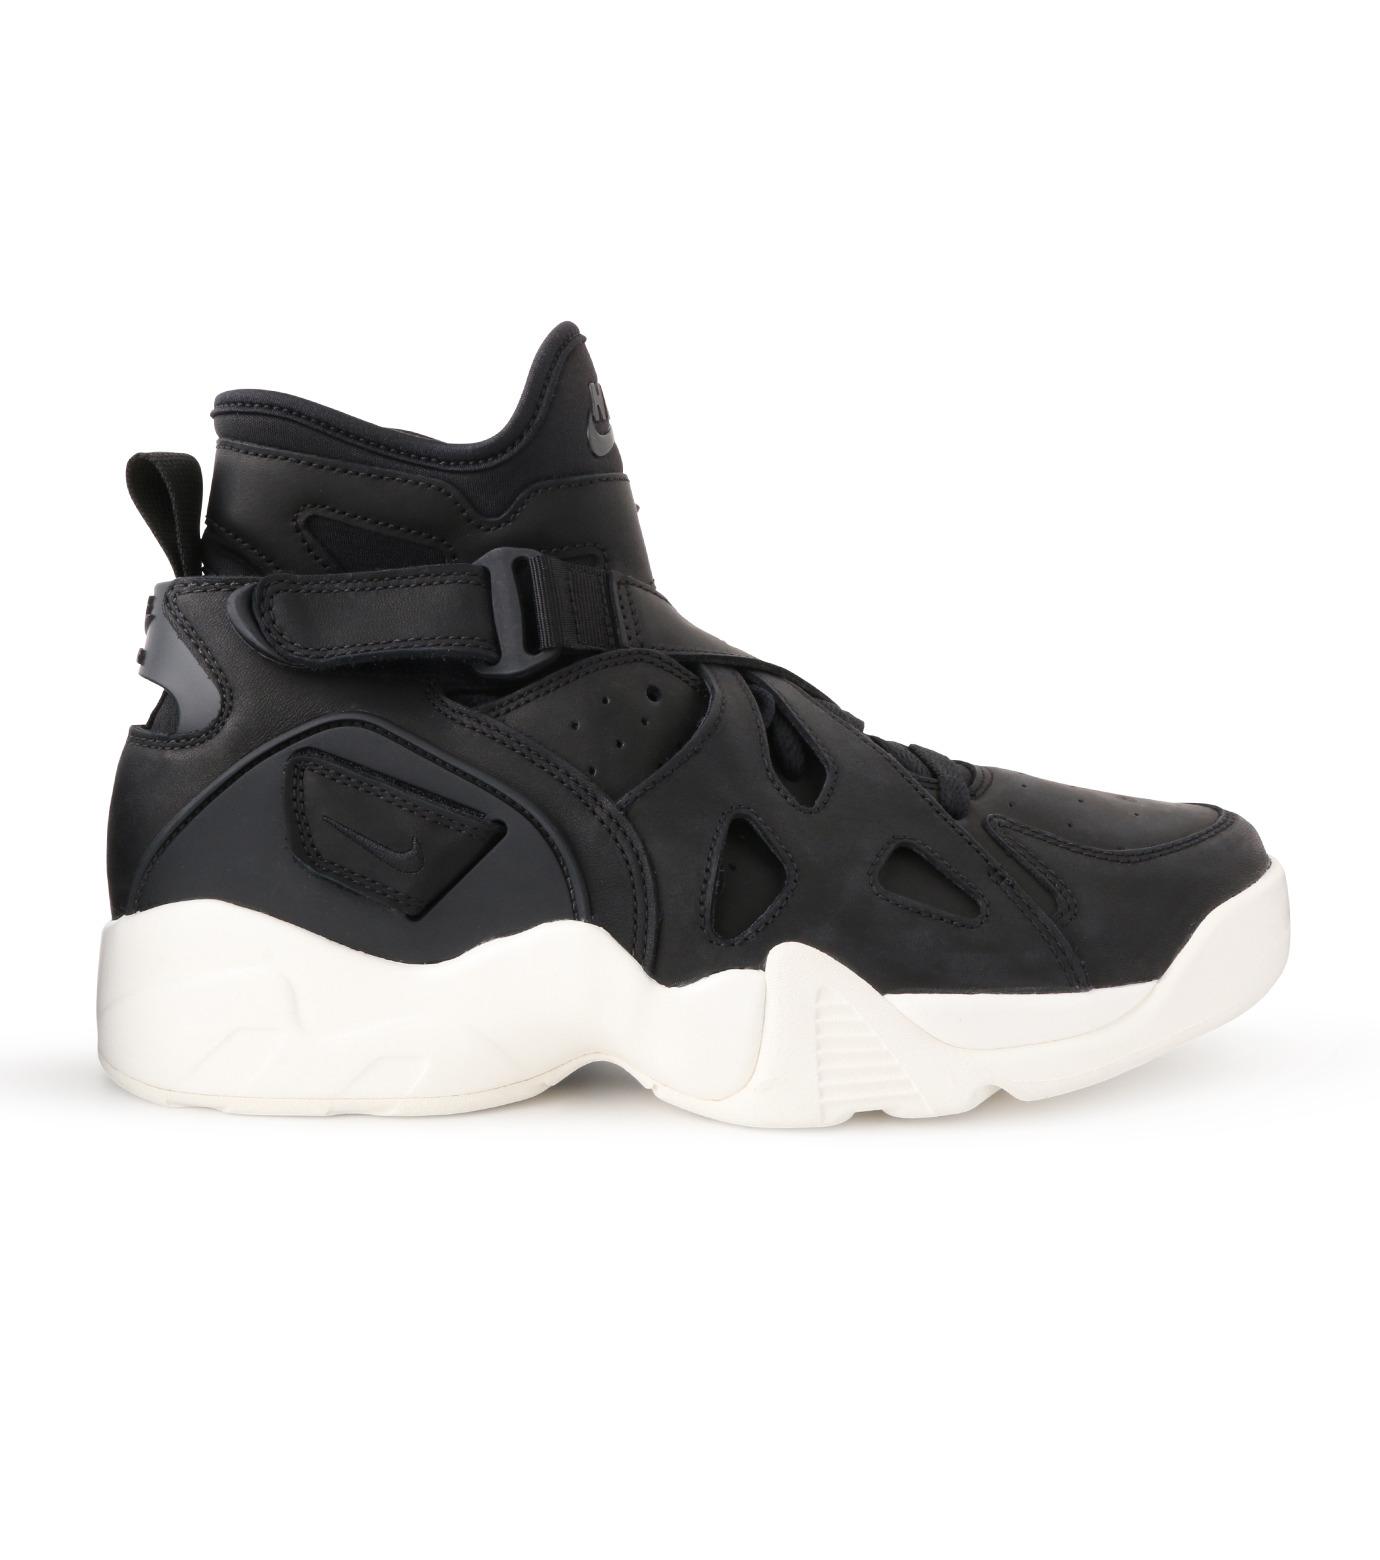 NIKE(ナイキ)のAIR UNLIMITED-BLACK(シューズ/shoes)-854318-003-13 拡大詳細画像1